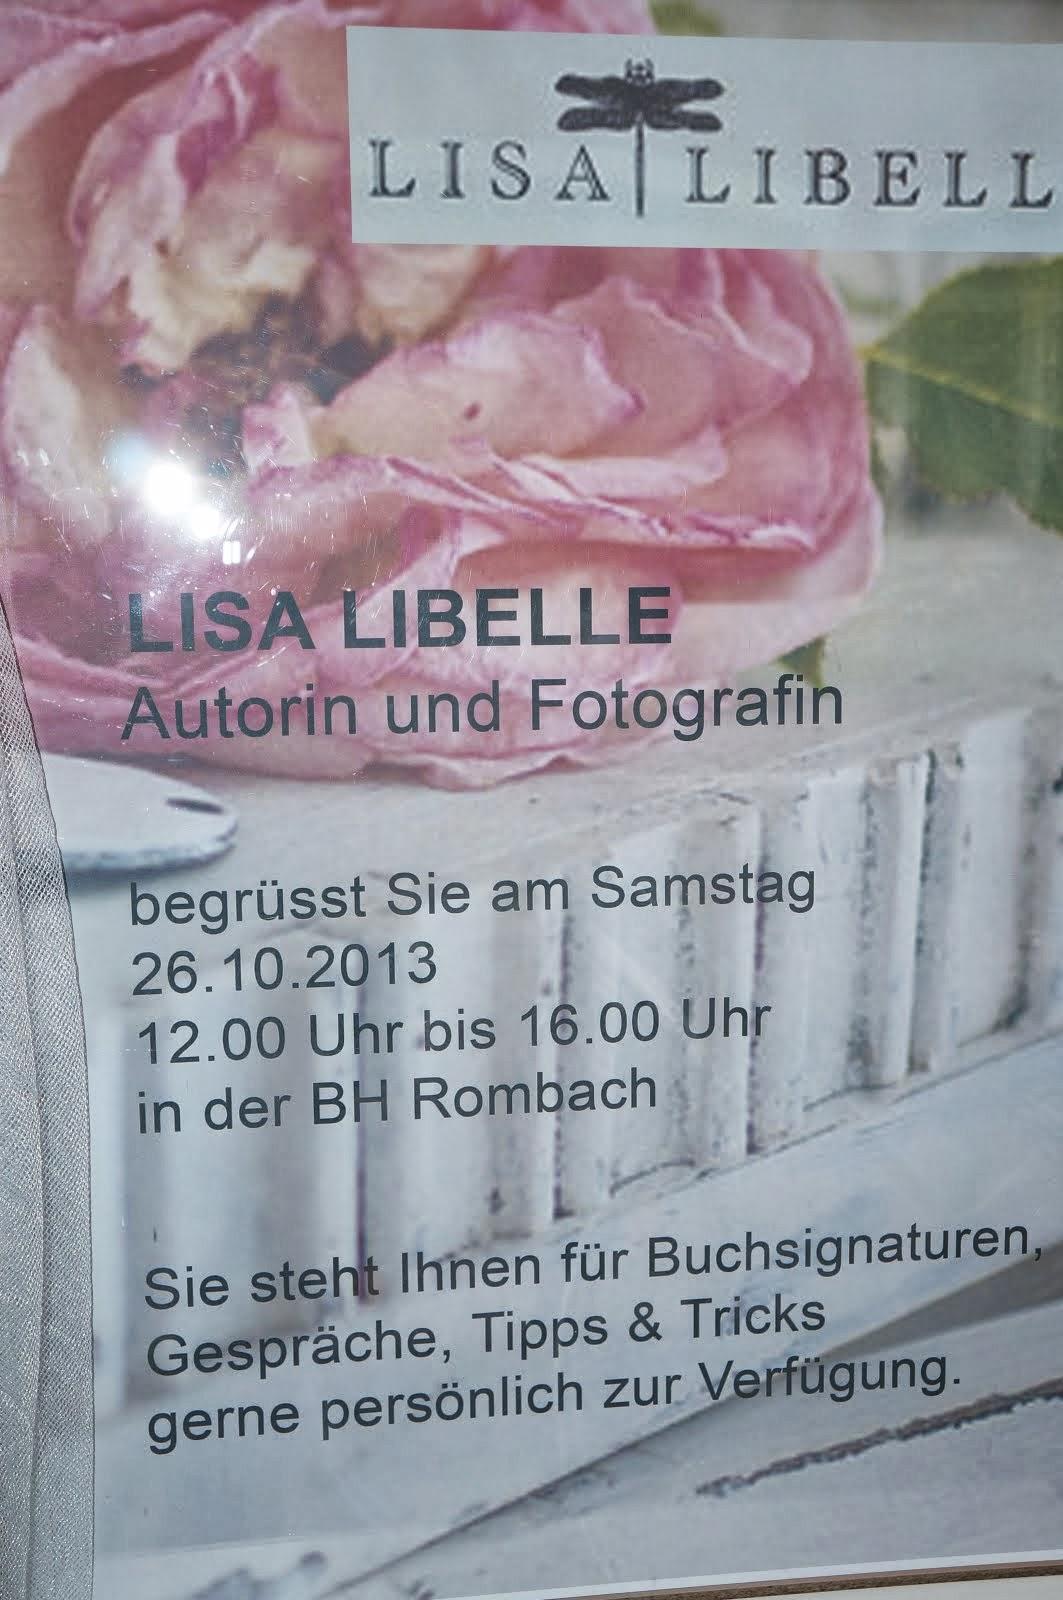 LISA LIBELLE in der BH Rombach D-79098 Freiburg i.B.